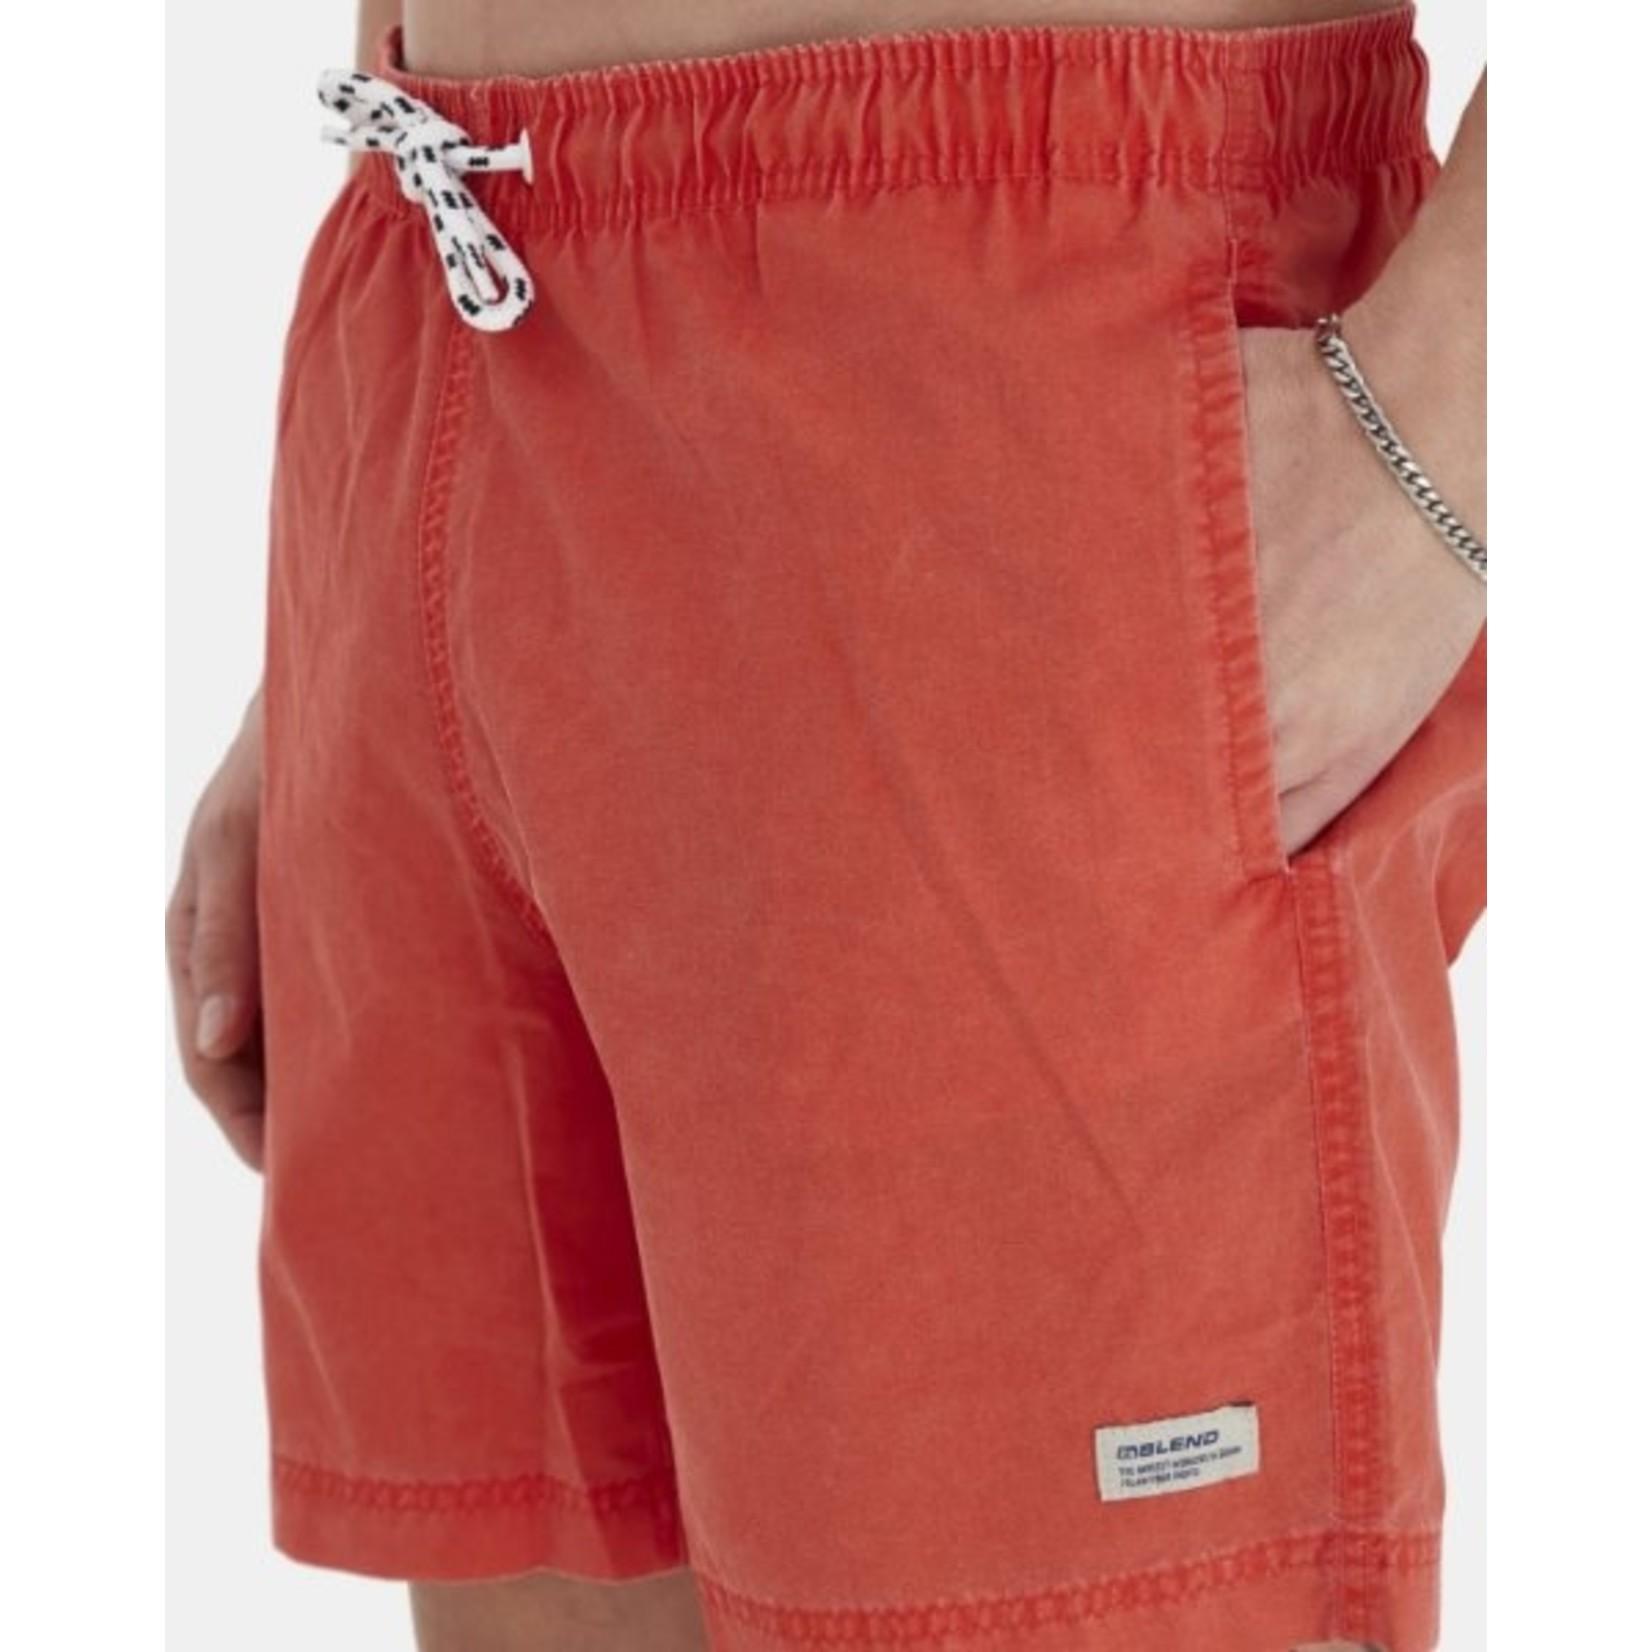 Blend Blend 20712253 Swim Shorts